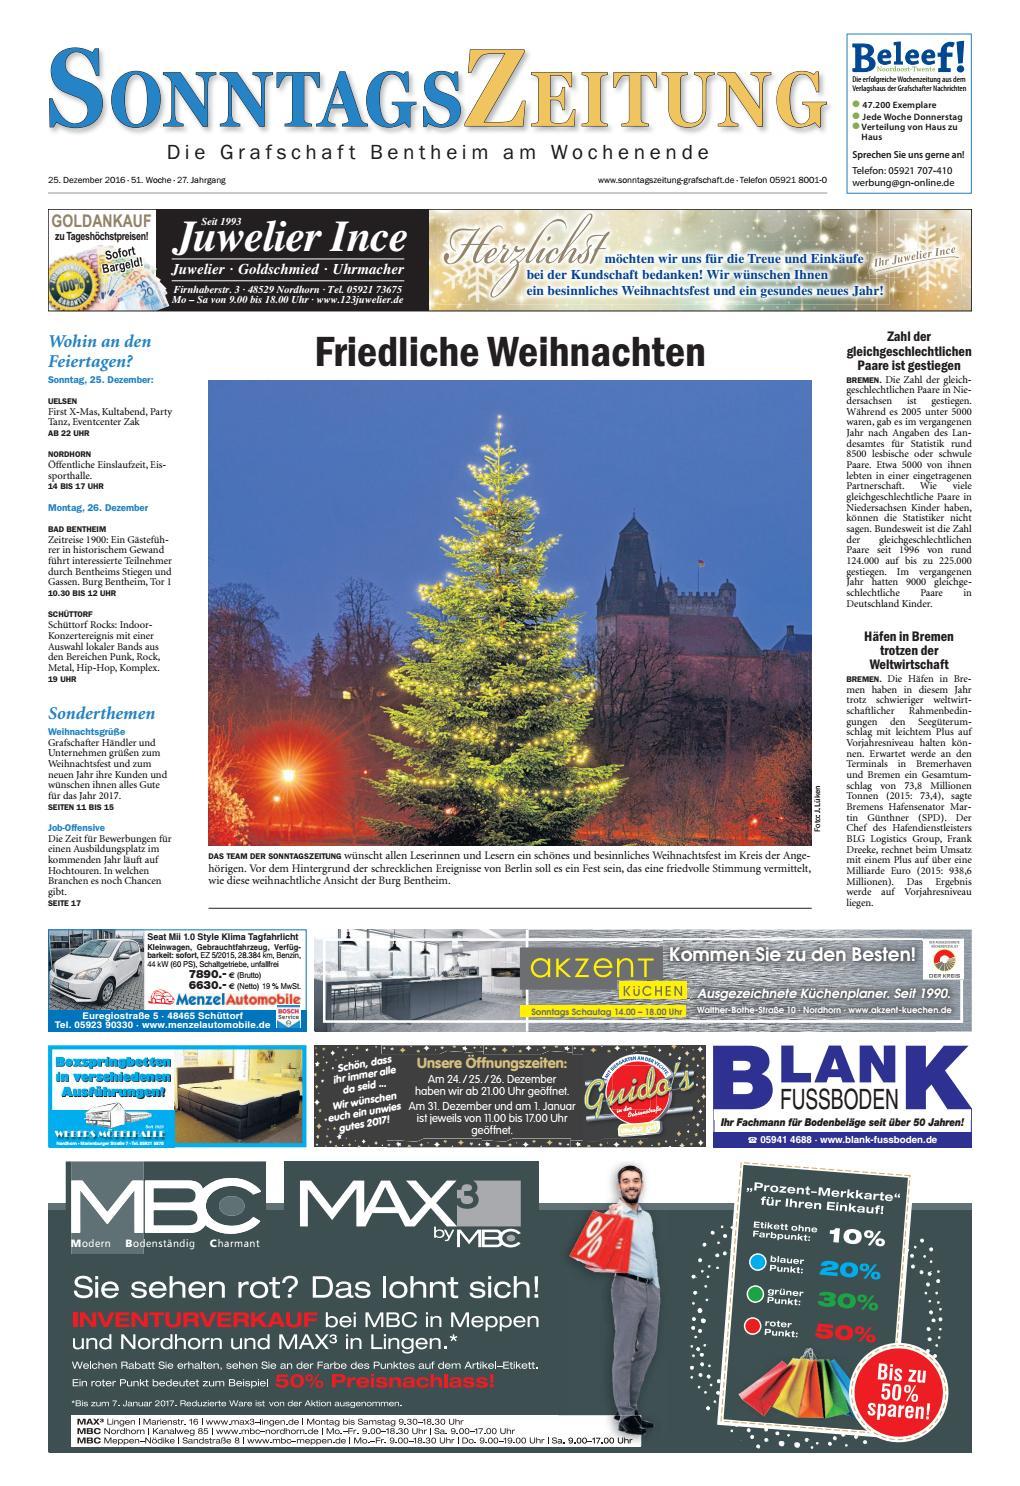 Sonntagszeitung 25 12 2016 By Sonntagszeitung Issuu